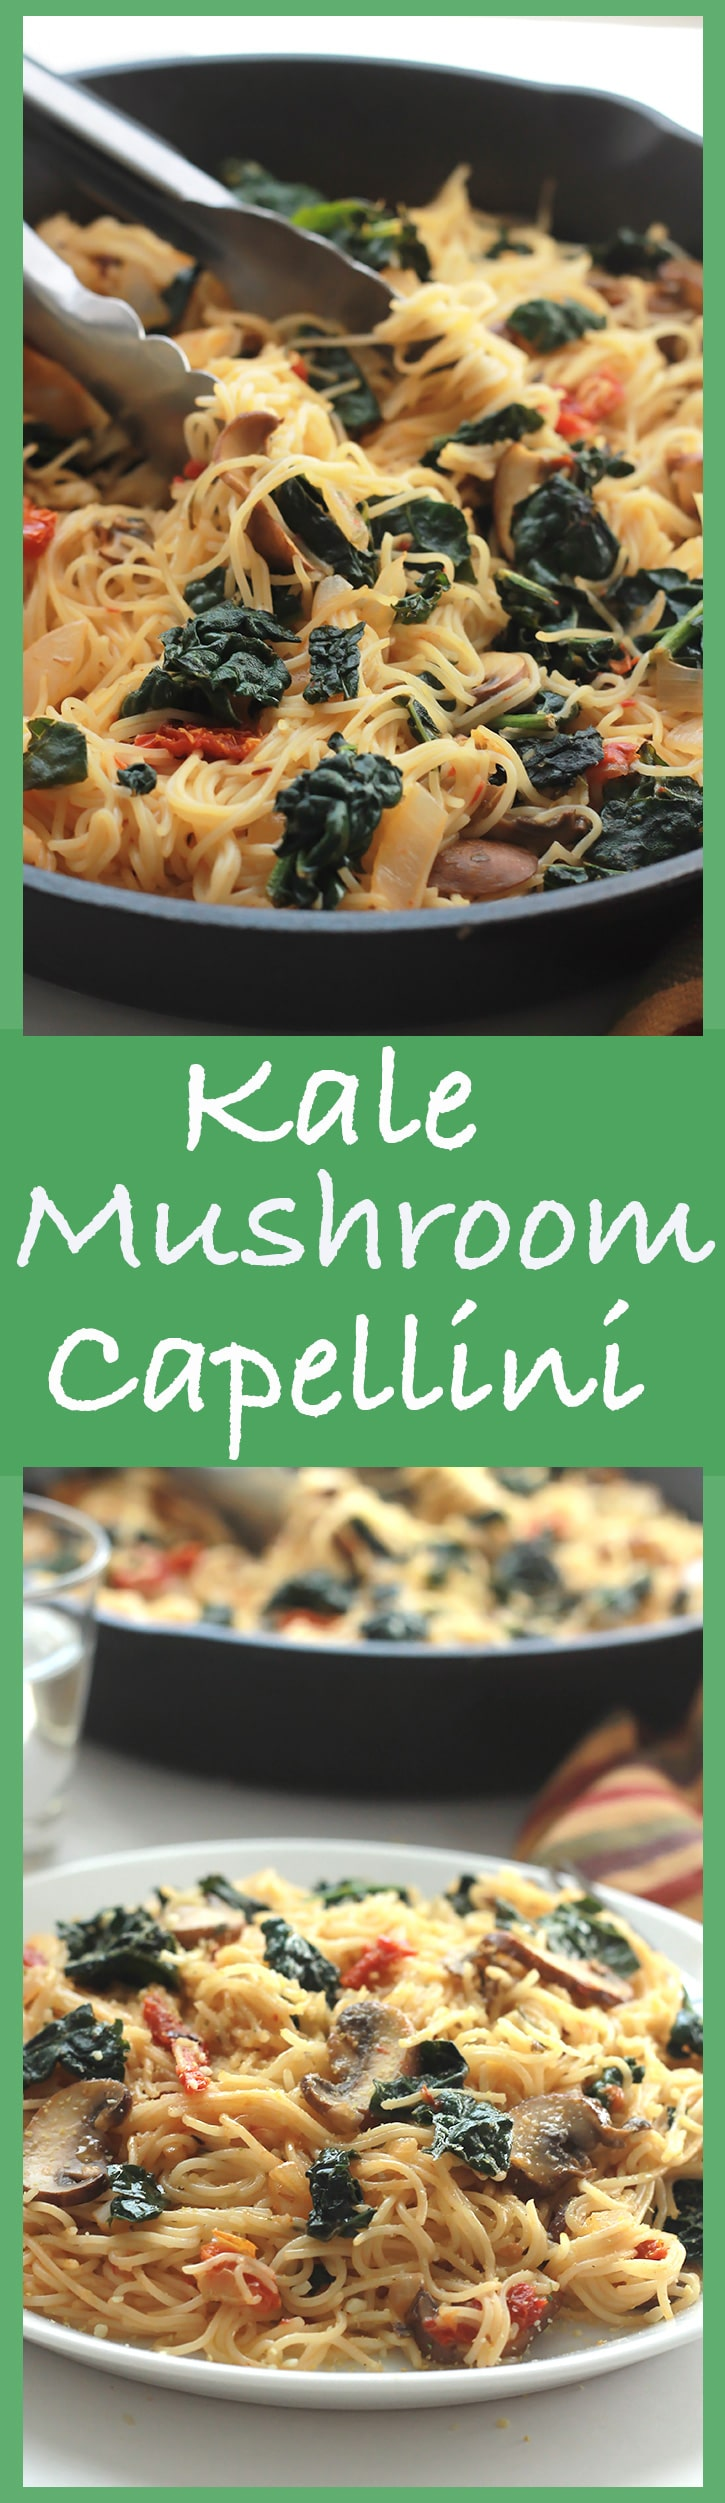 Kale-mushroom-Capellini-Pin